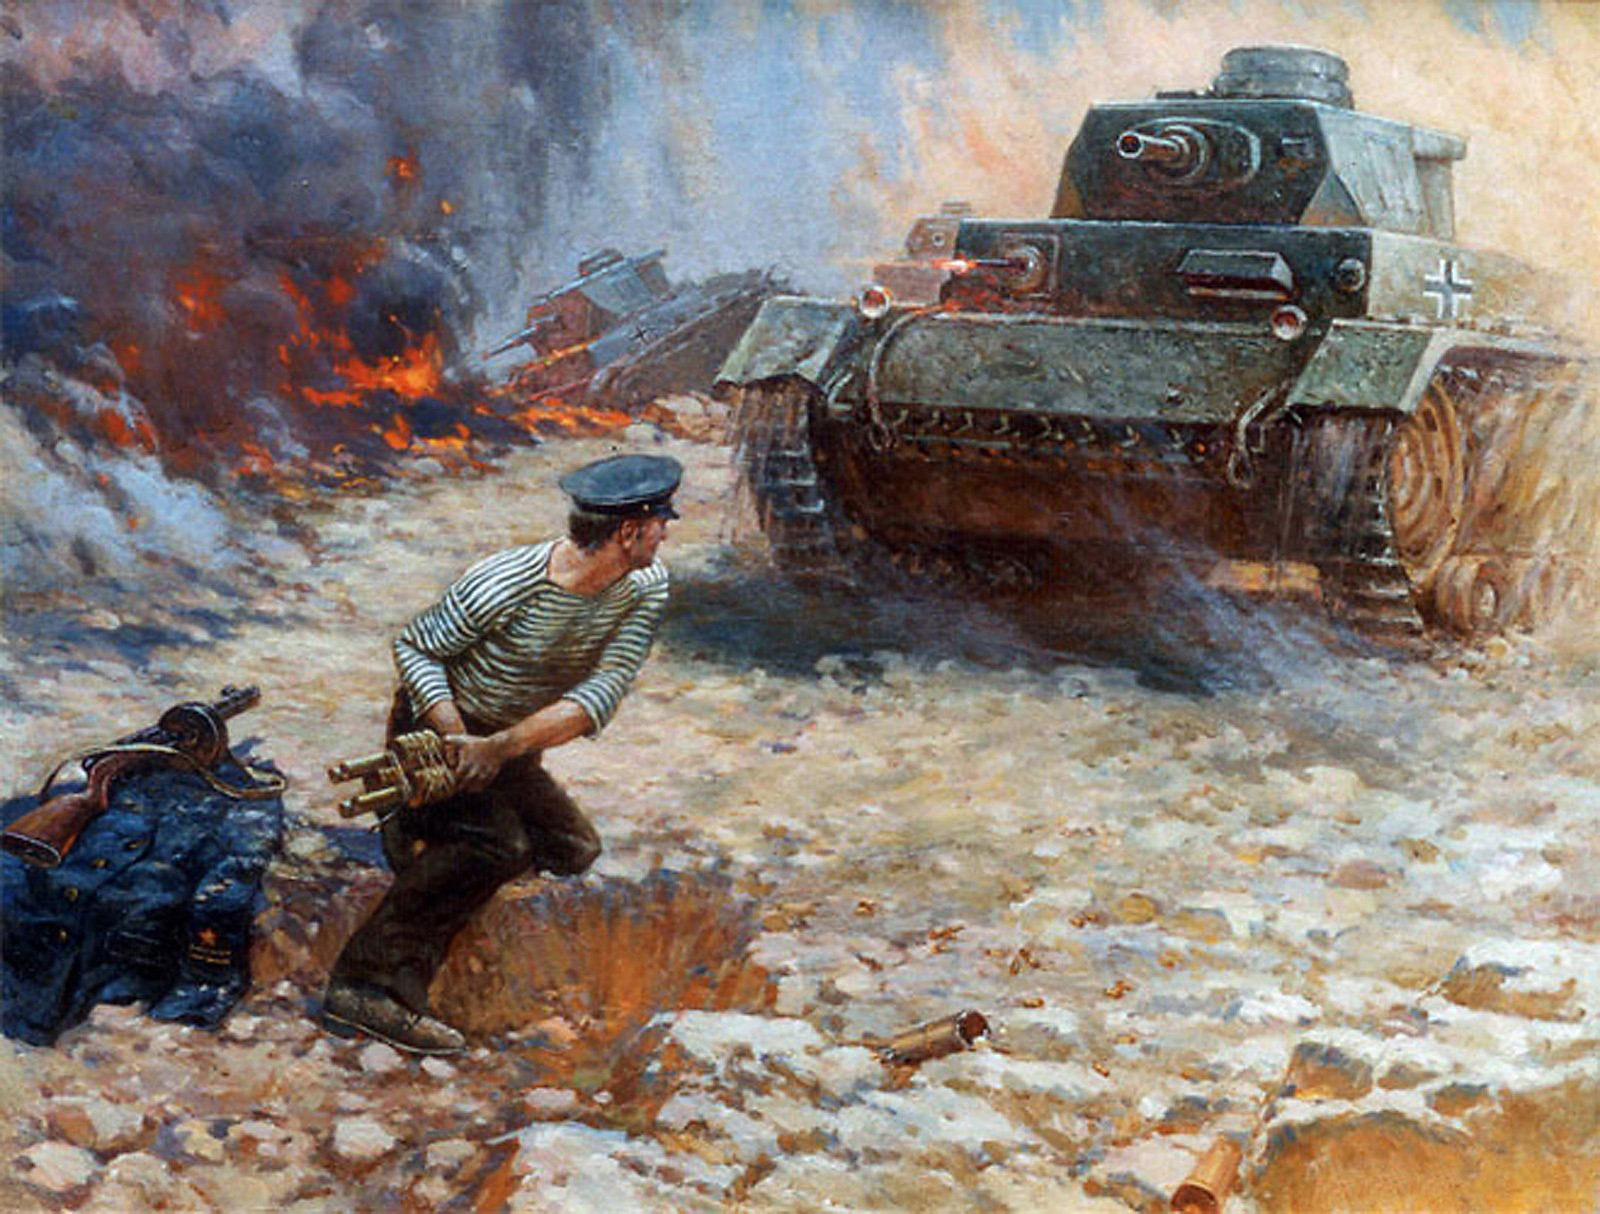 картина уничтожение немецкого танка